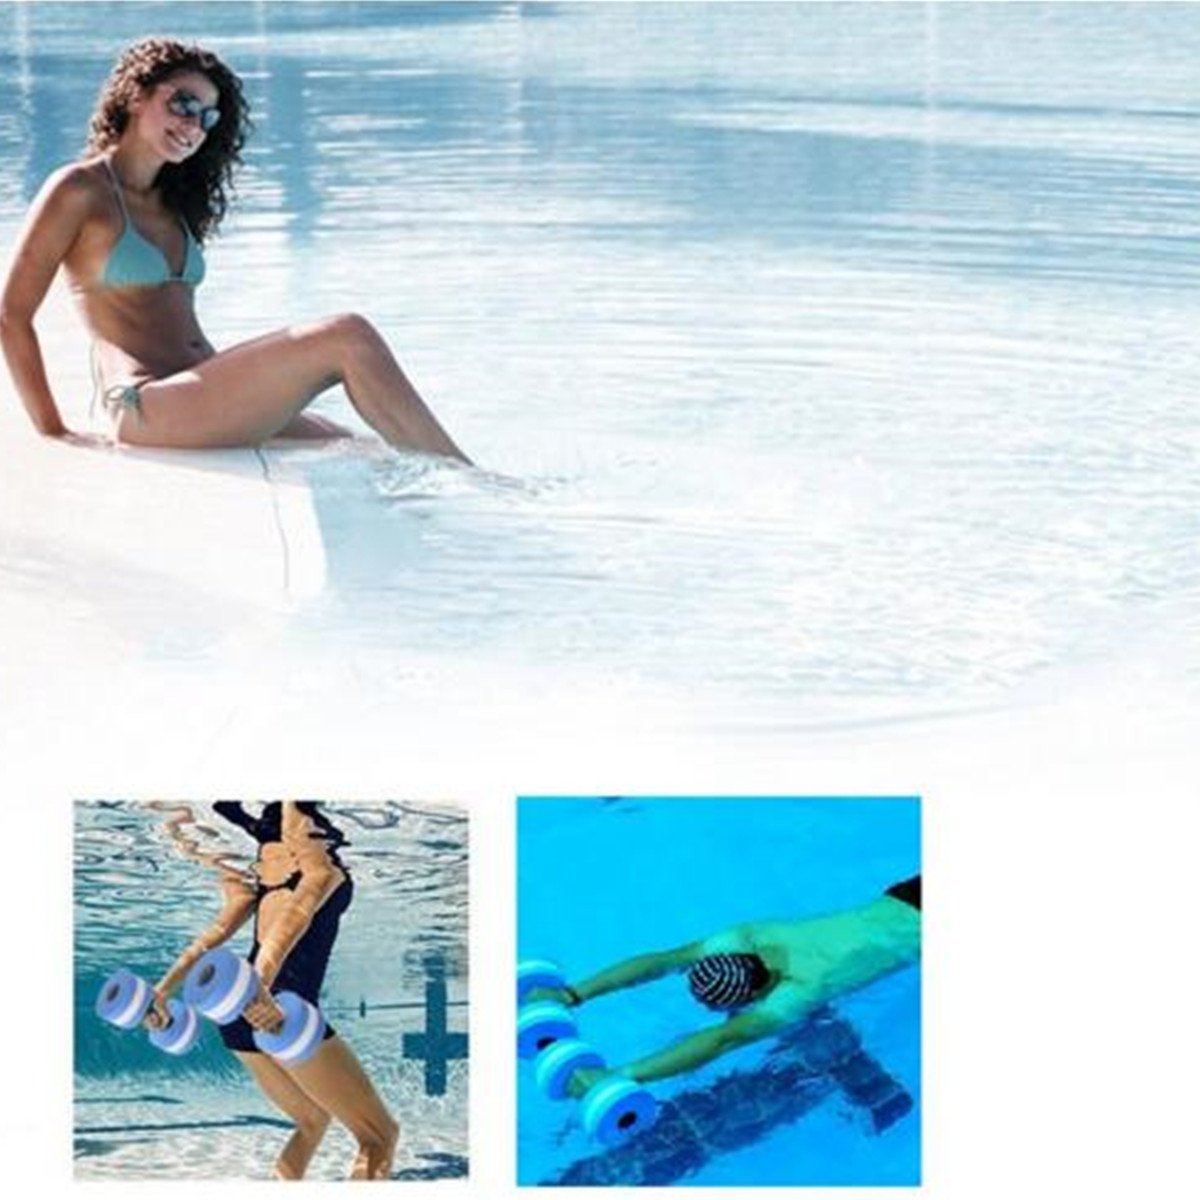 verisa agua ejercicio aeróbico espuma mancuernas piscina resistencia 1 par, equipo de Fitness ejercicios de agua para pérdida de peso azul - 1 par - 3 ...